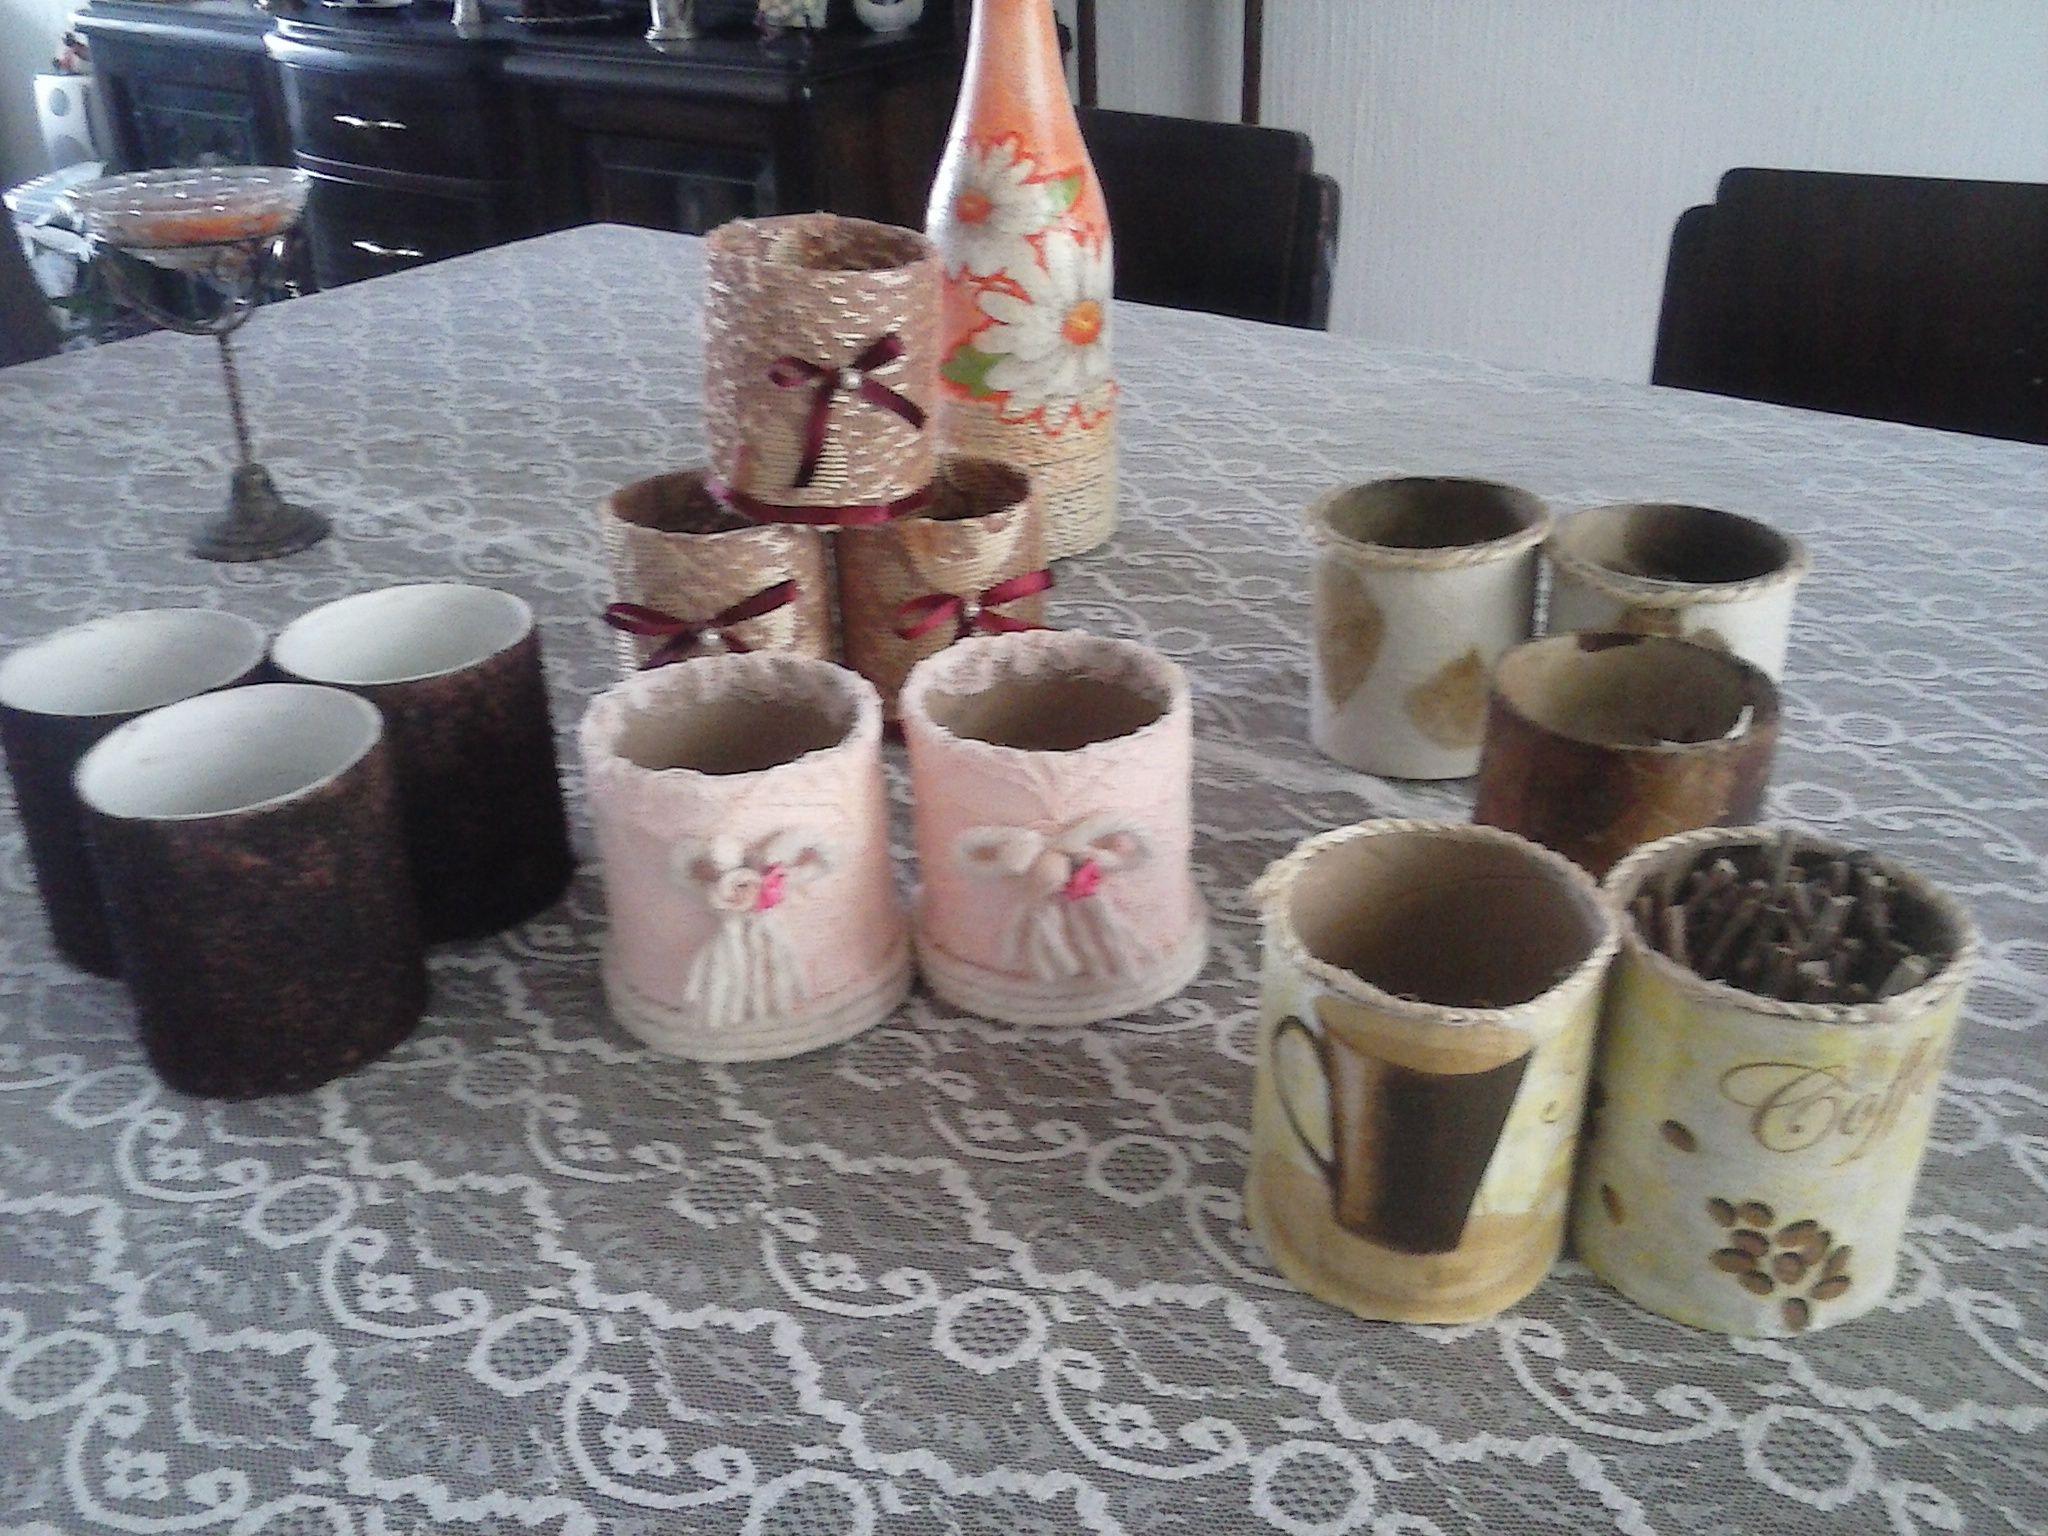 Reutilización de tubos vacios de papel tamaño jumbo. Decorados con diferentes materiales.